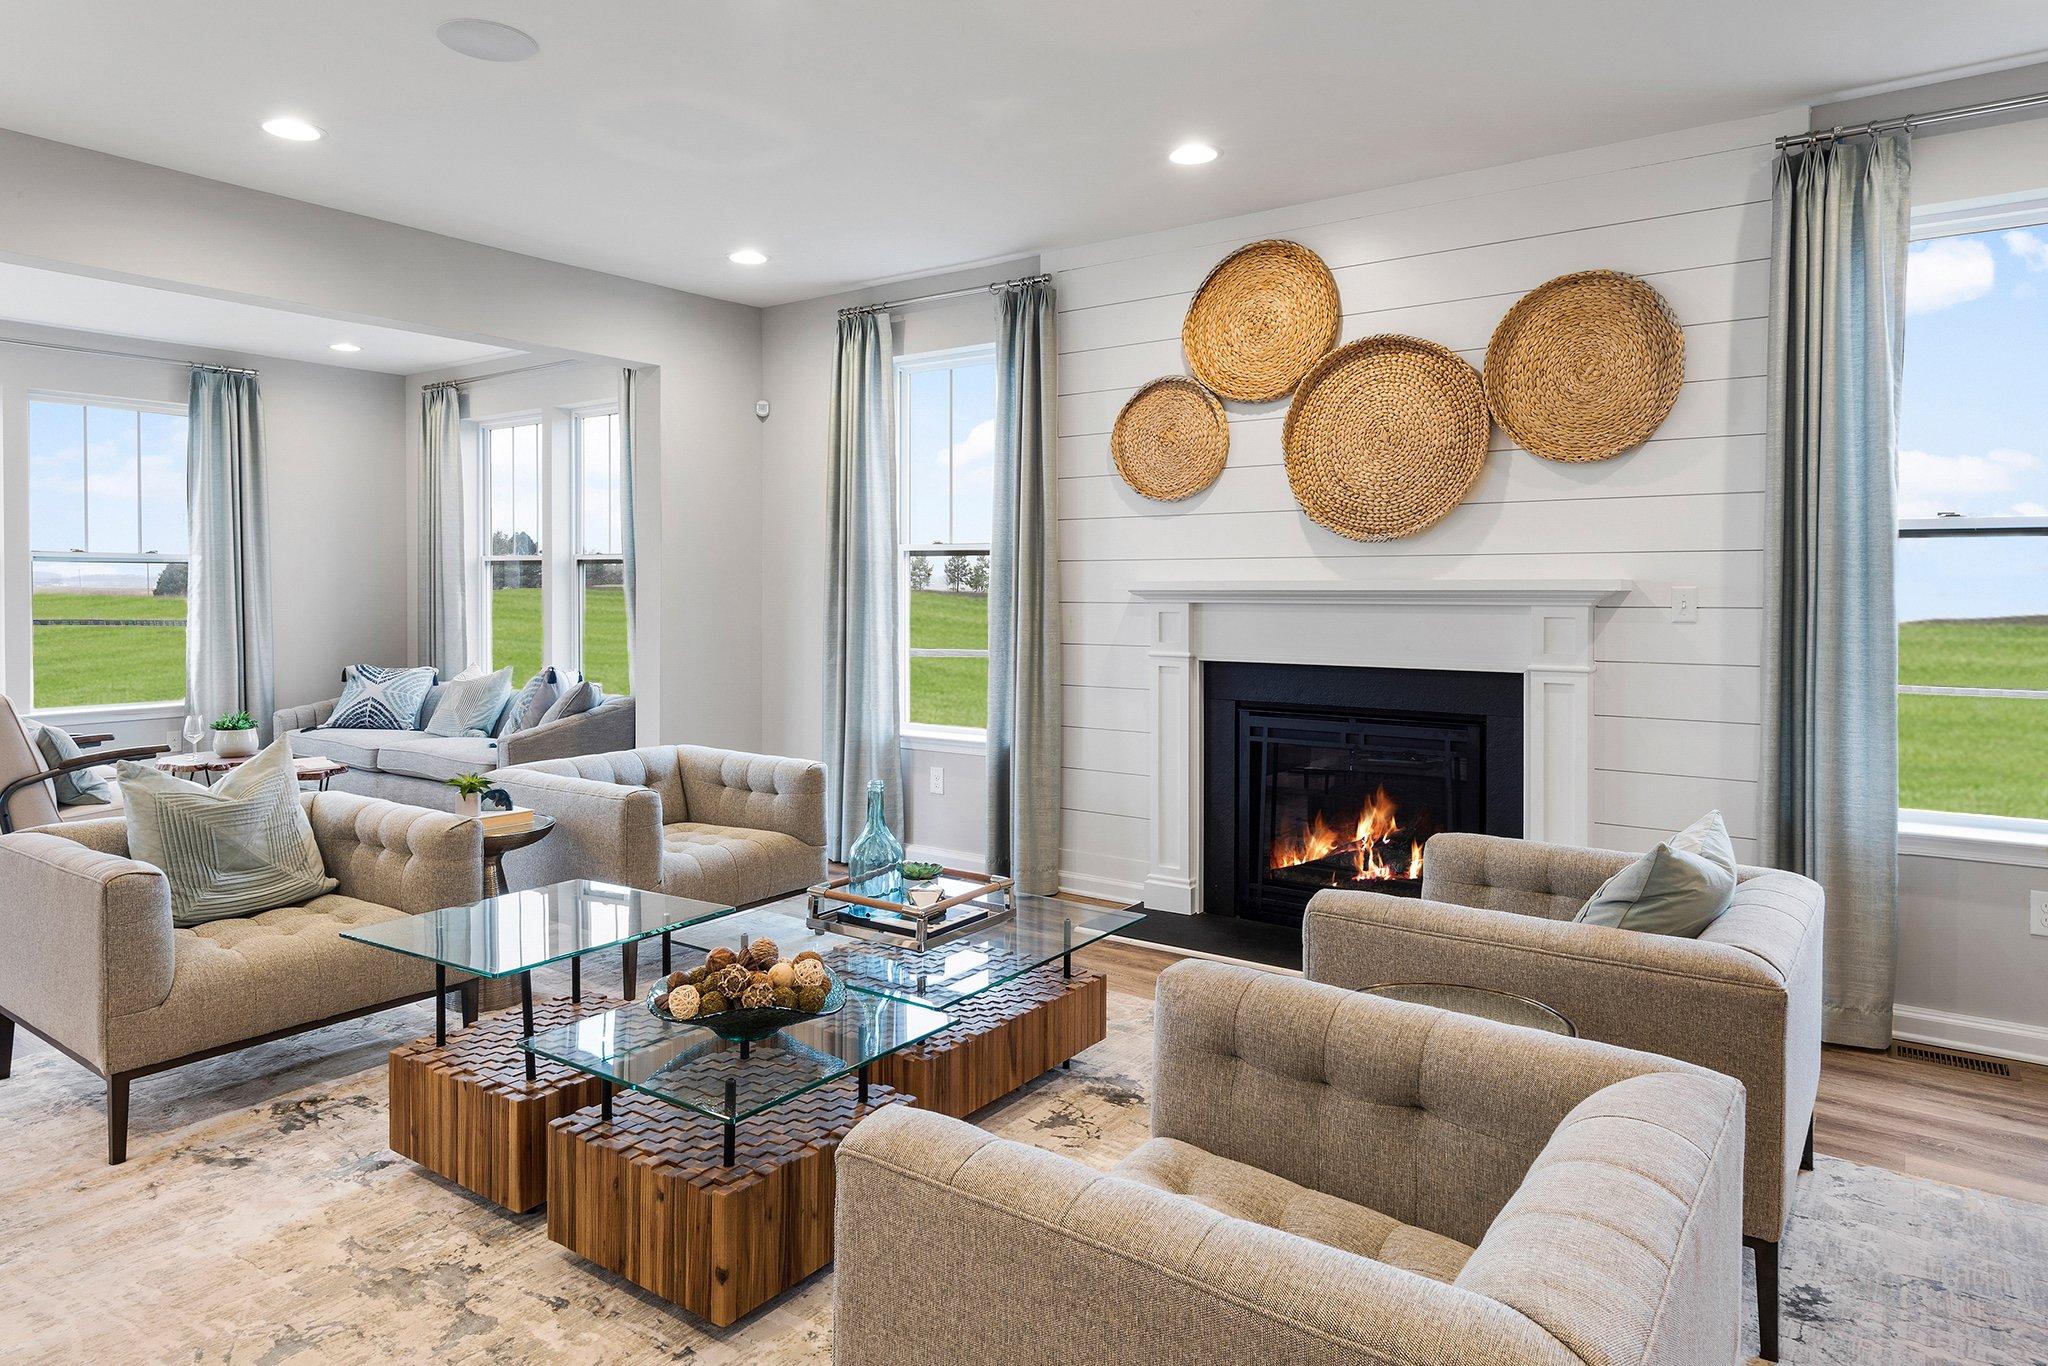 Open Concept vs. The Traditional Floor Plan